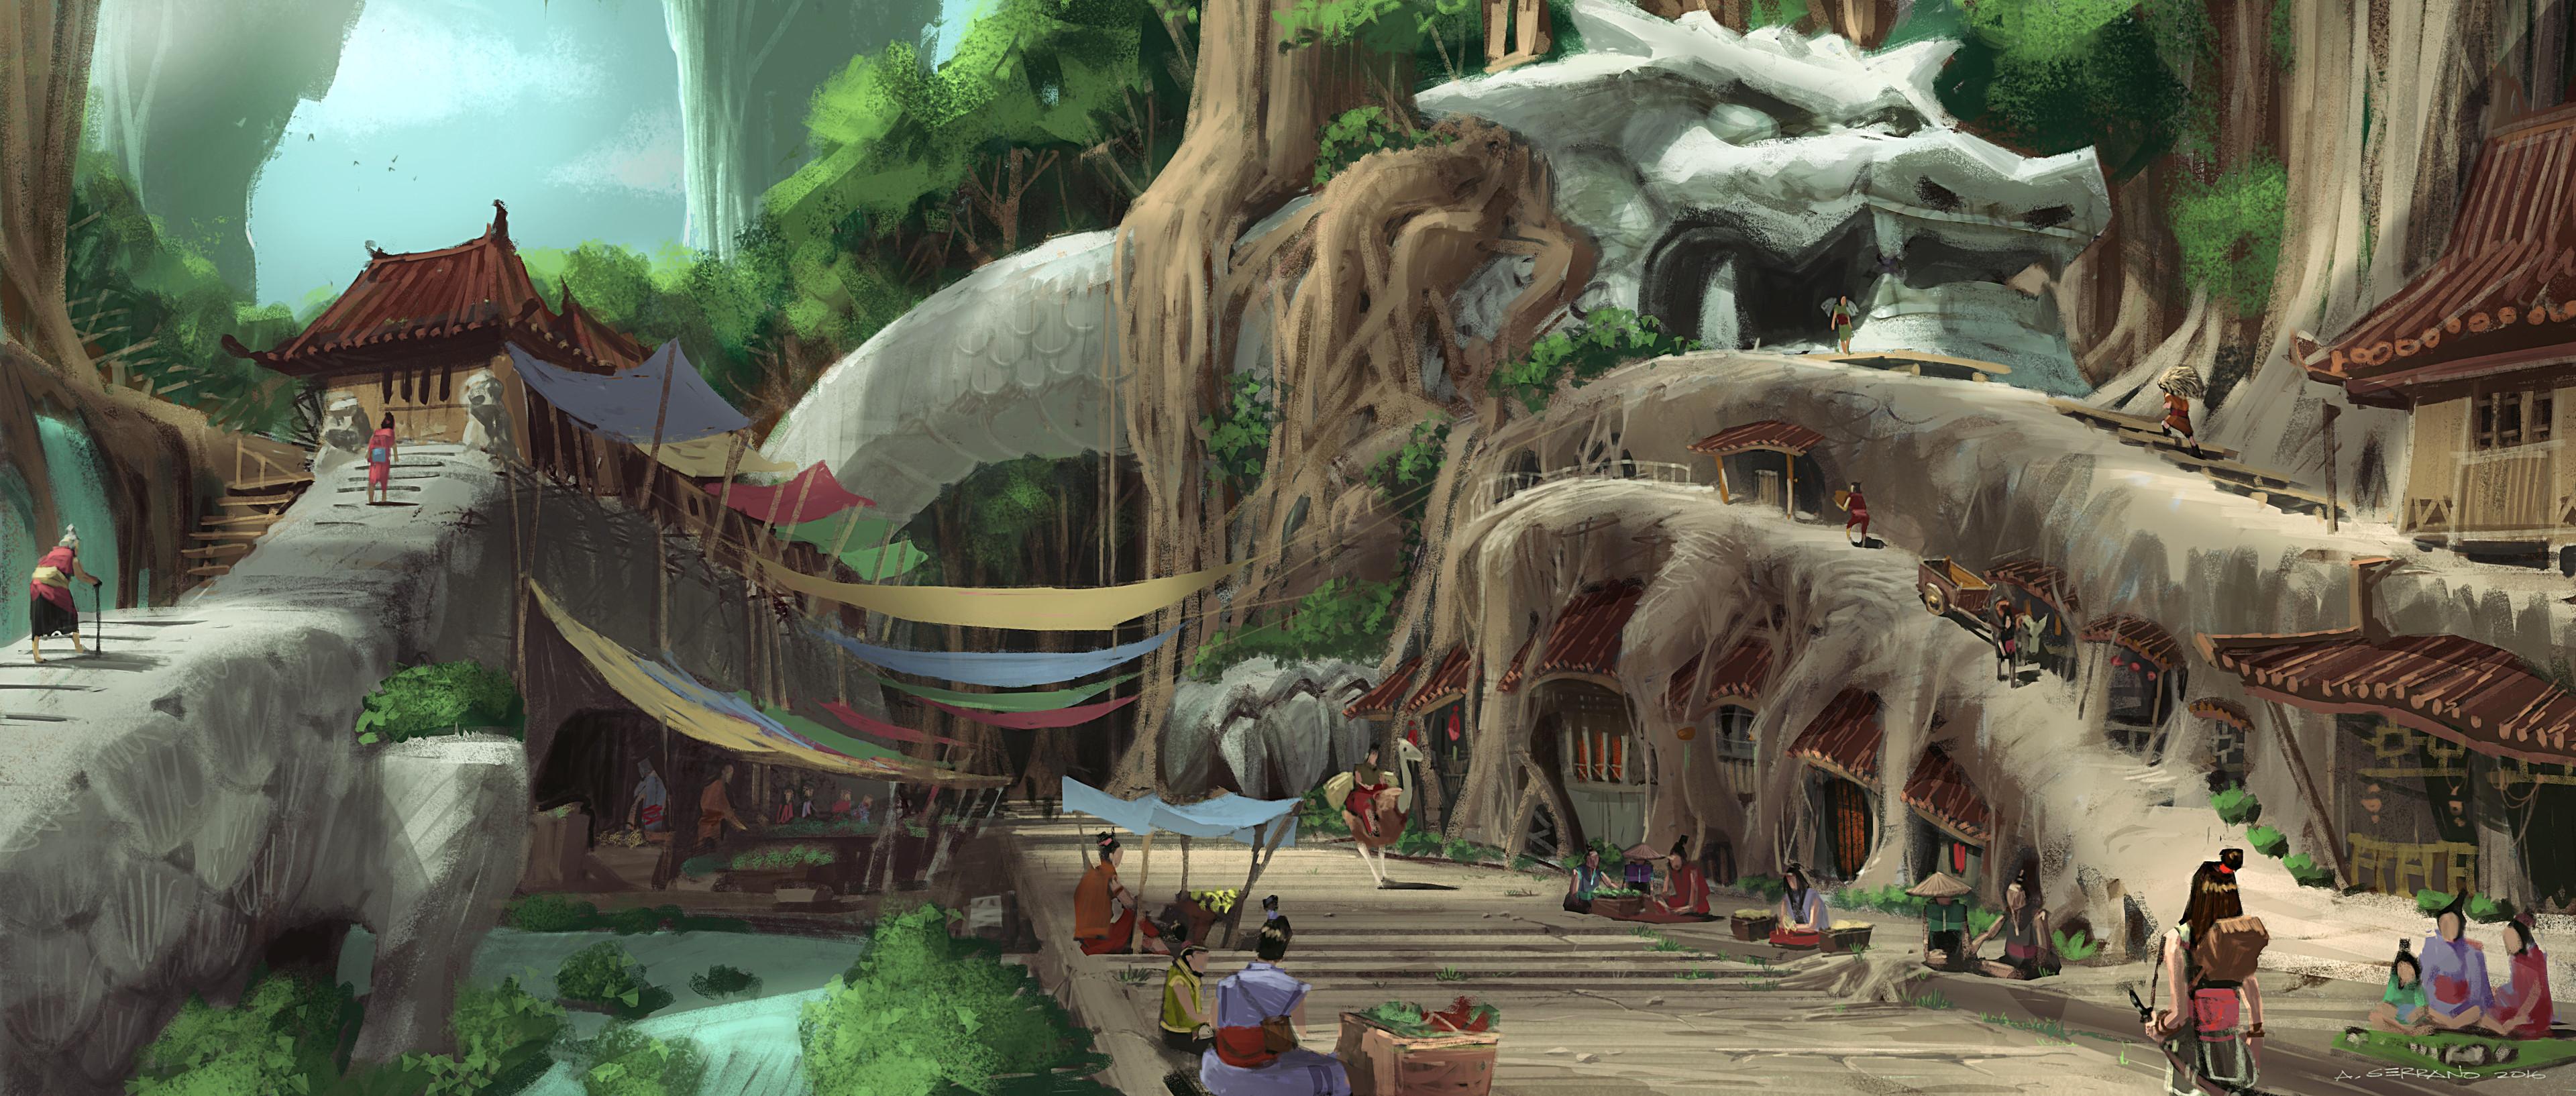 Raya and the Last Dragon Concept Art 06